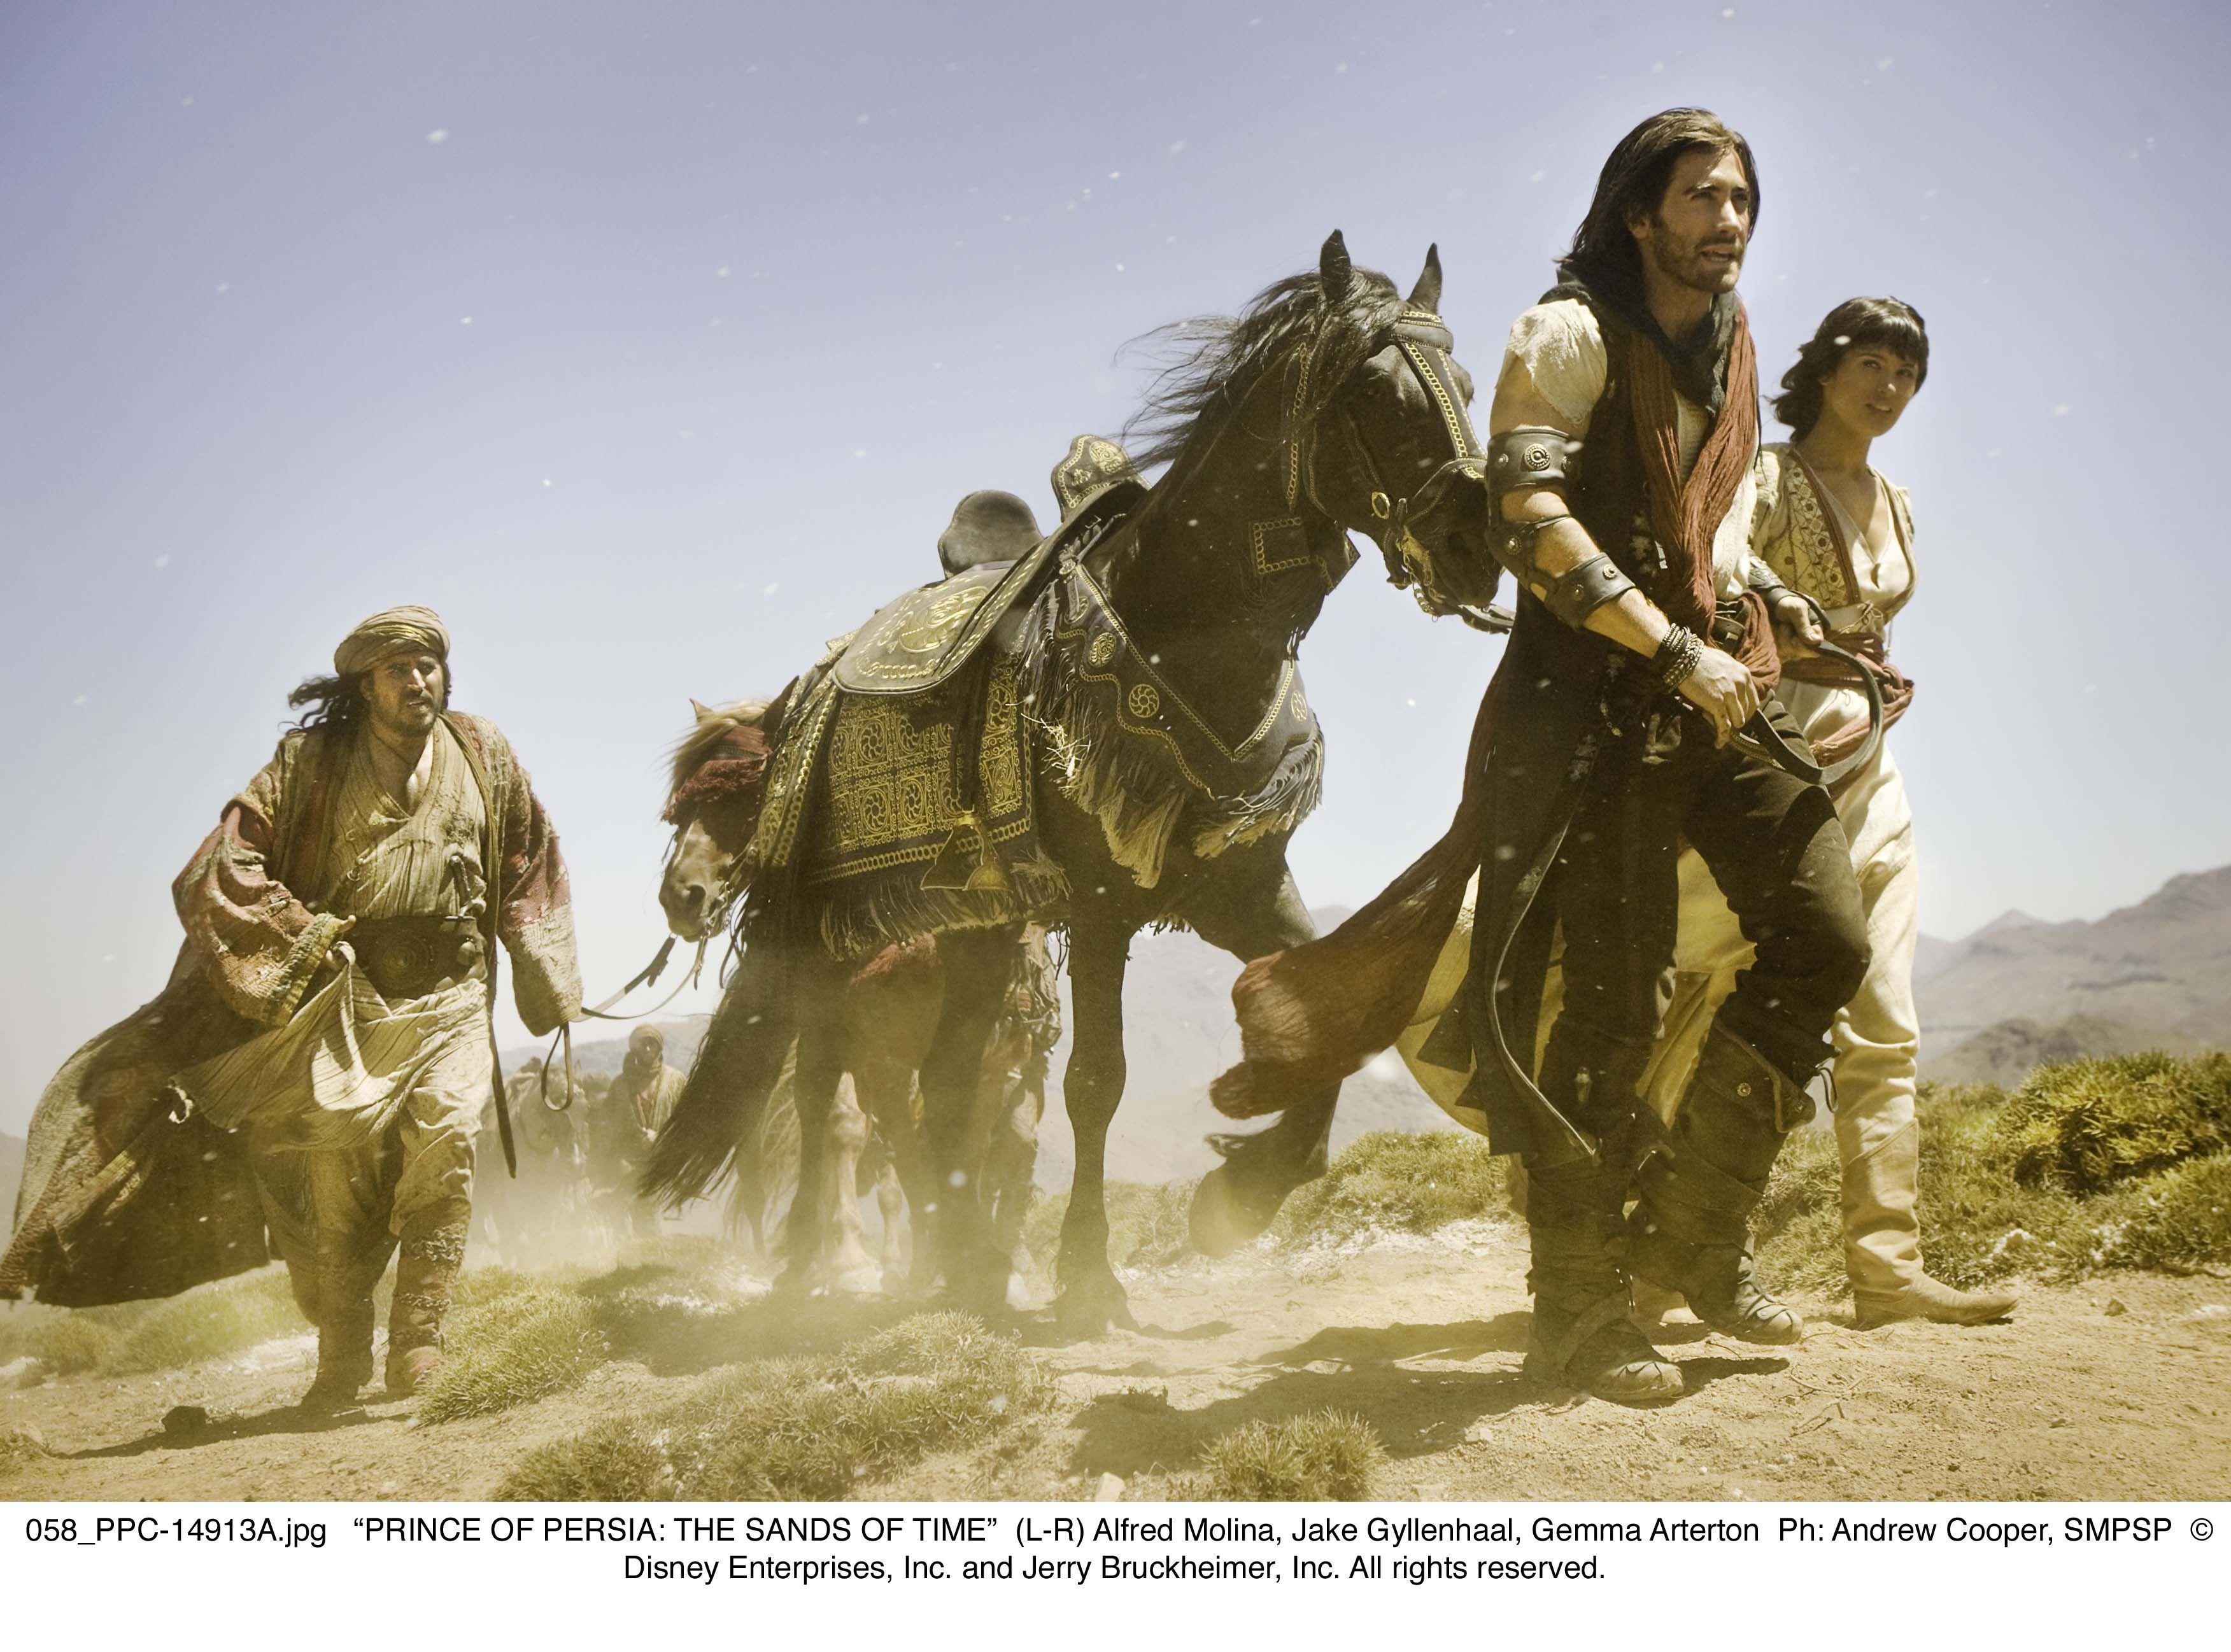 Simple Wallpaper Movie Prince Persia - 6bcba6f8a57a4984f8b9a909417cad26  Trends_278125.jpg